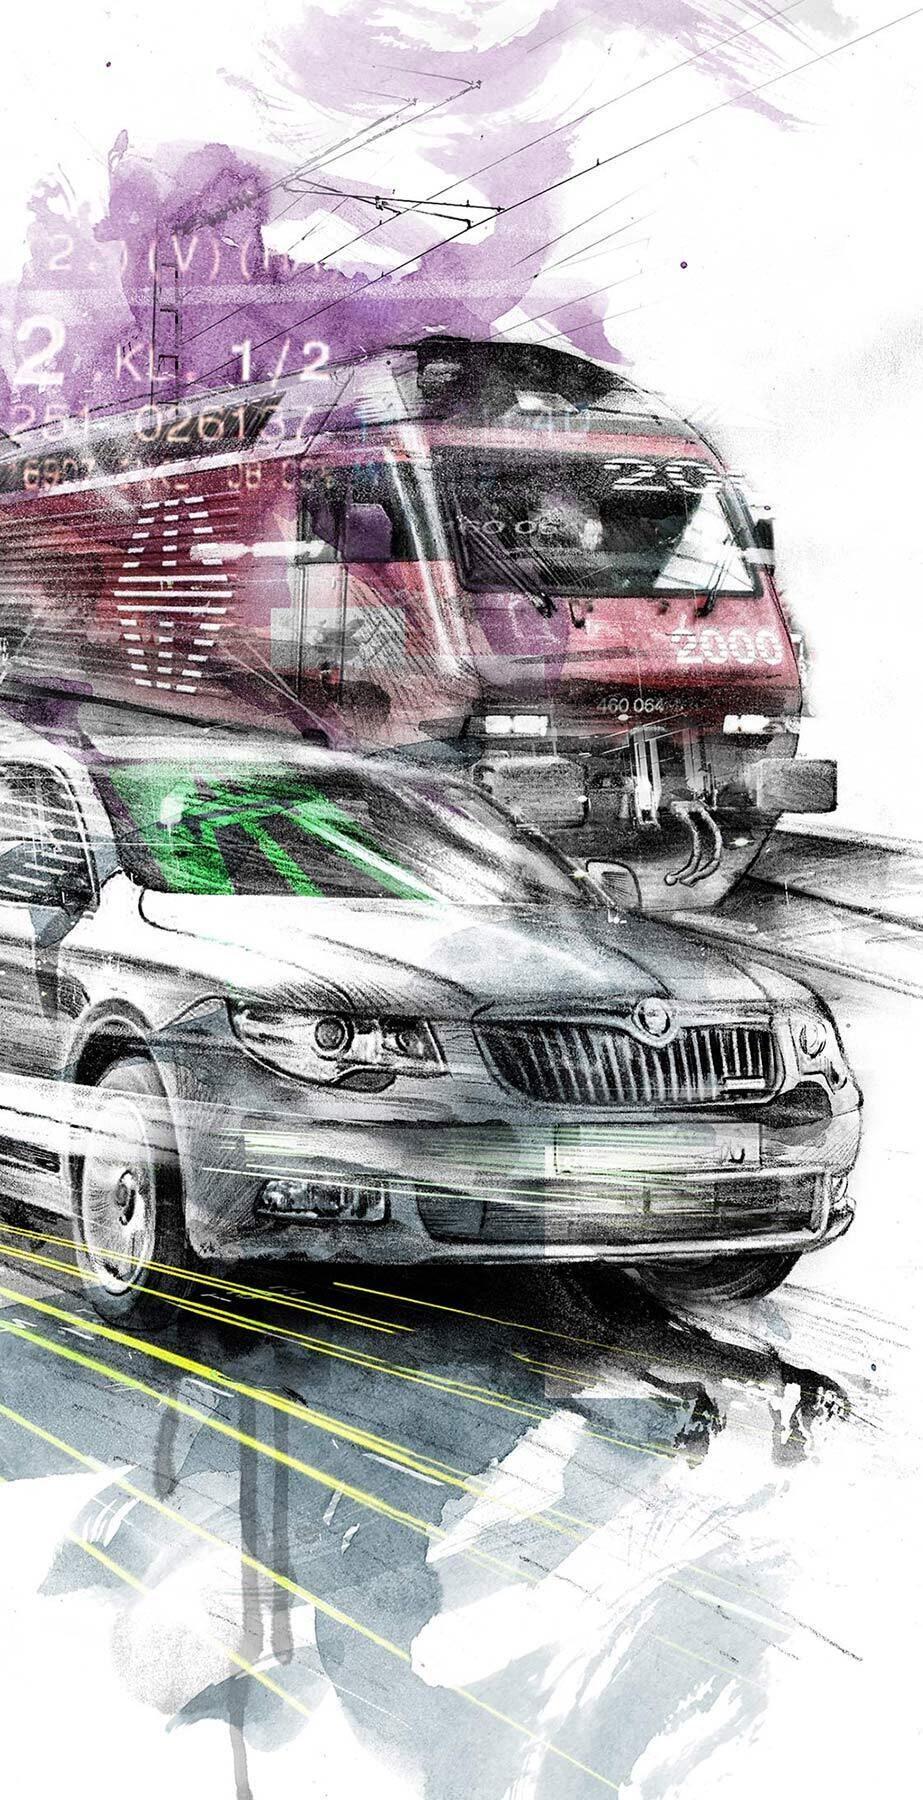 SBB vs PKW Zug Auto Illustration - Kornel Illustration   Kornel Stadler portfolio